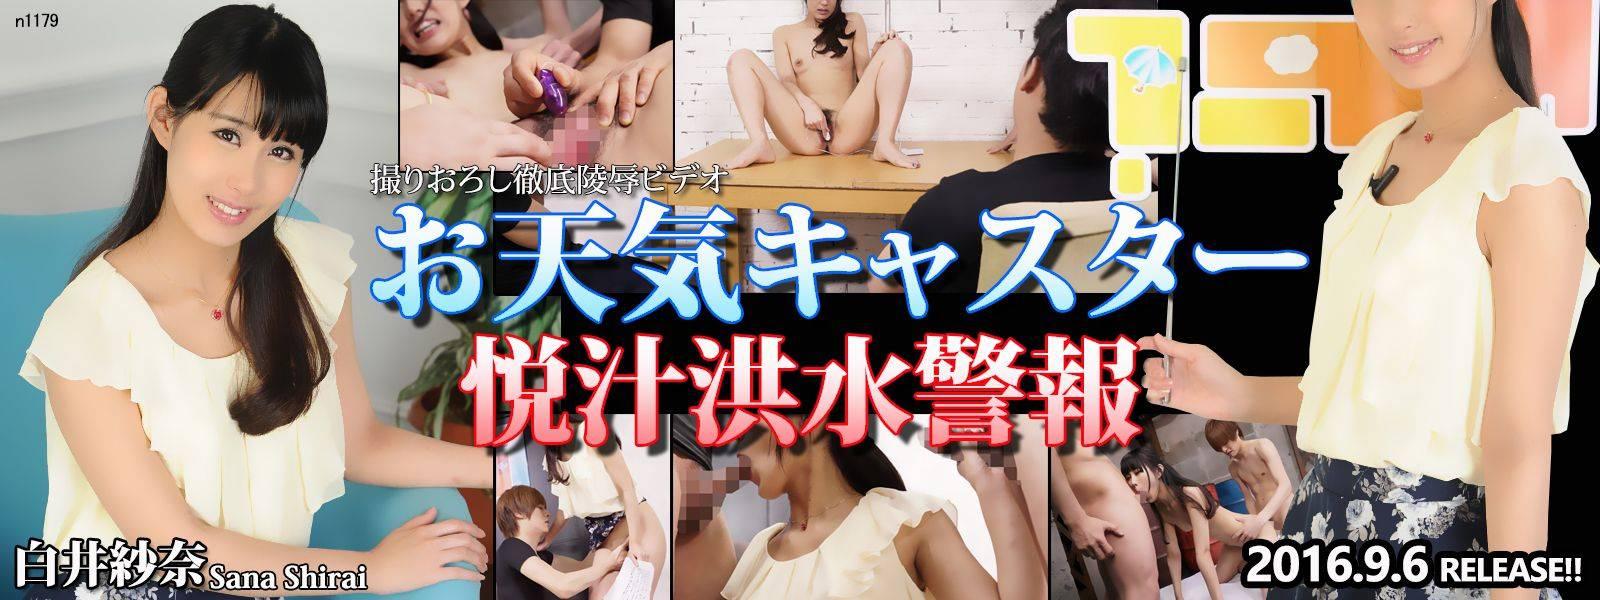 【MEGA】HEYZO-0995美痴女之系統工程師的色慾~齋藤真央